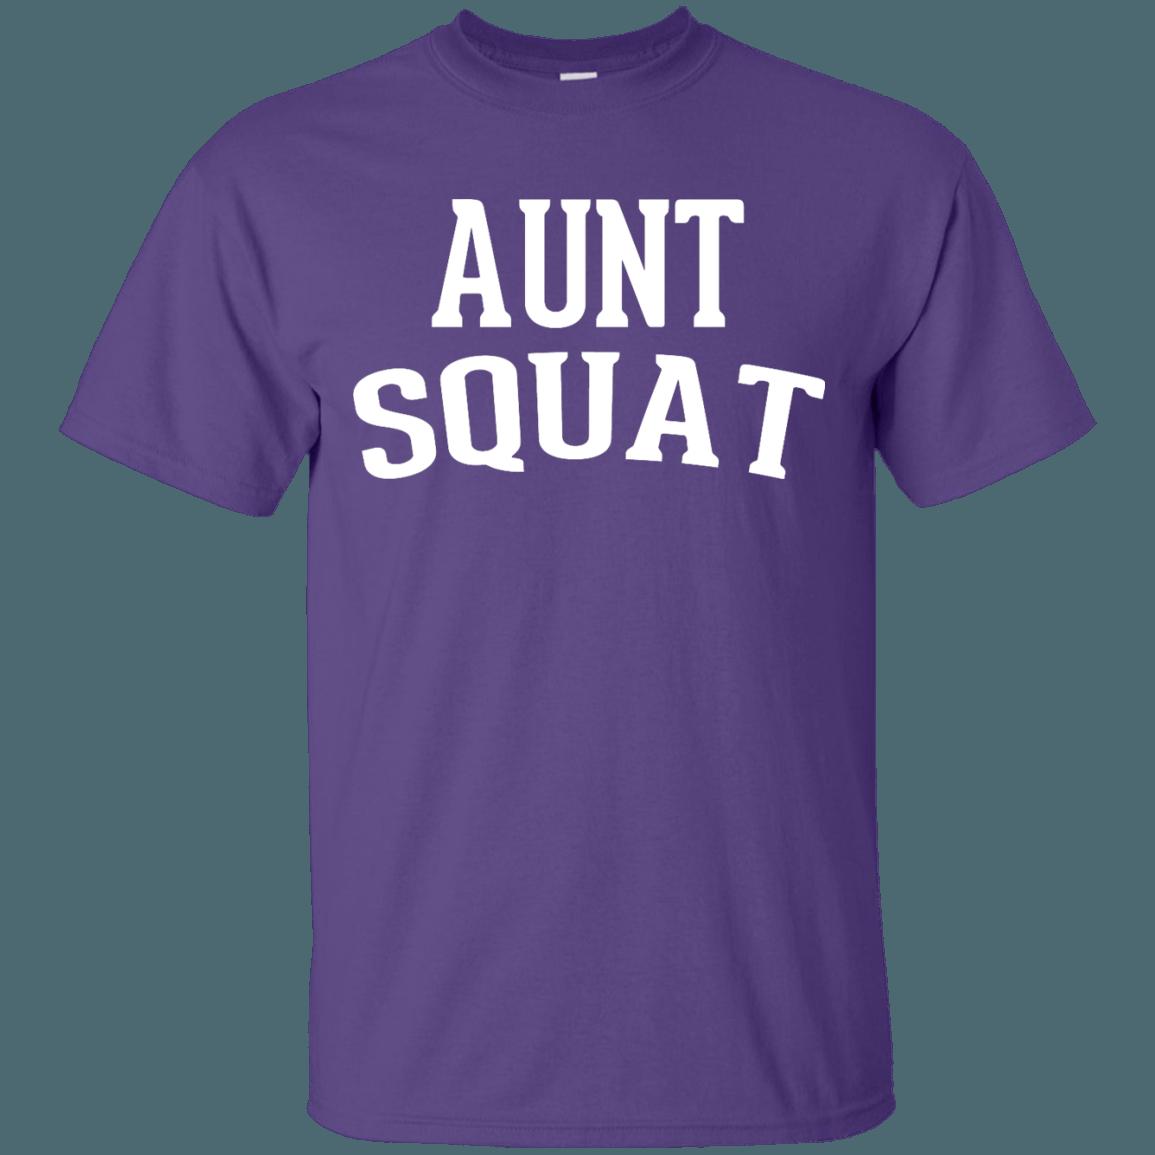 c6ac69d0d Aunt Squad Original T shirt 2016 - RobinPlaceFabrics